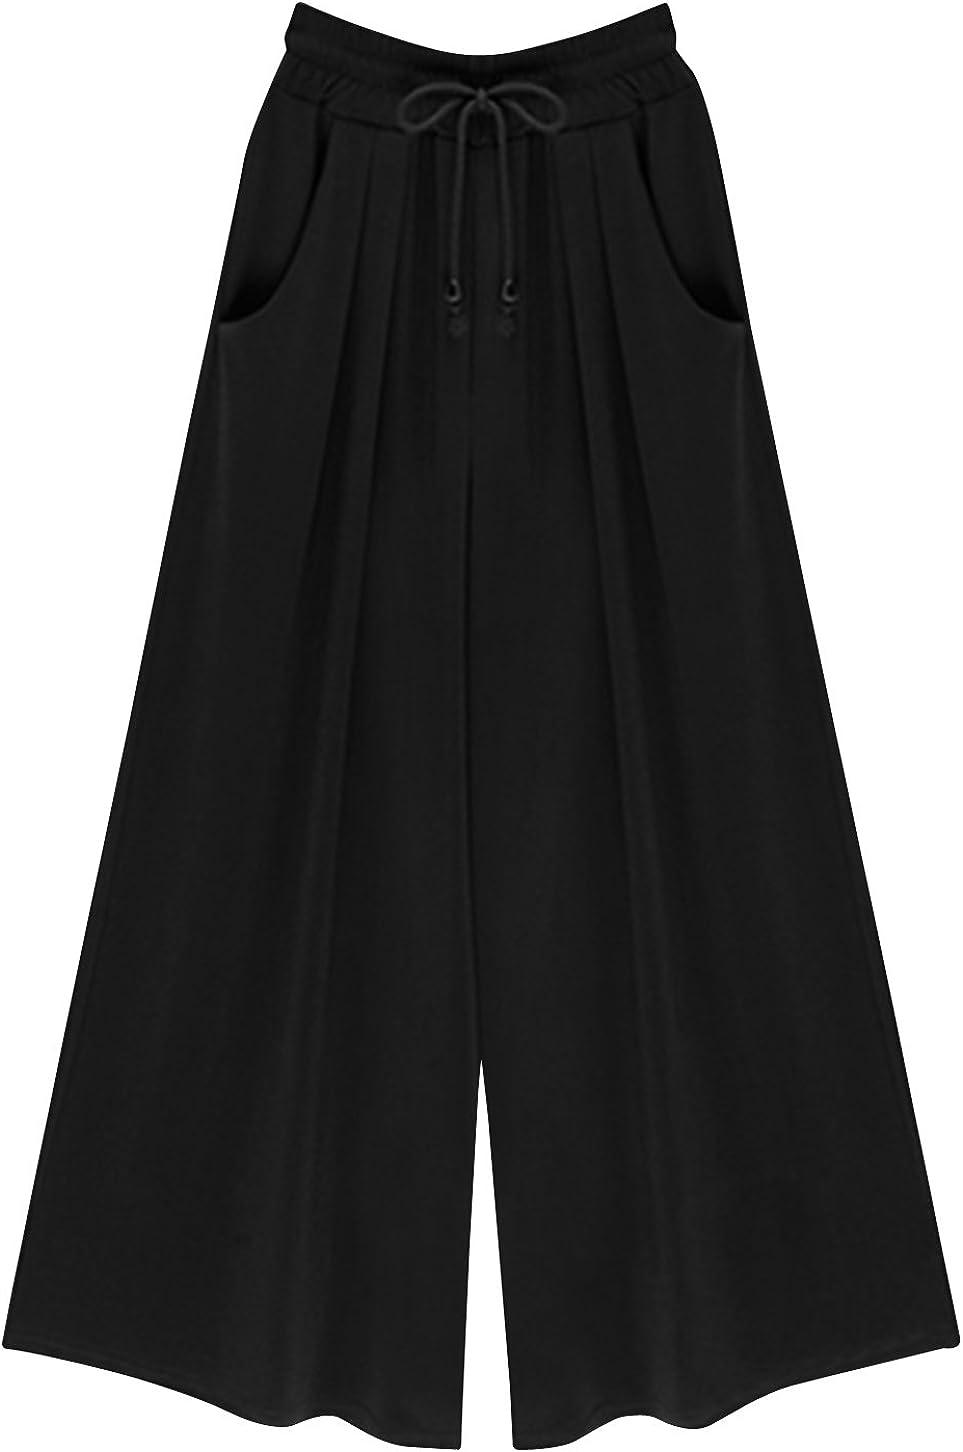 FEOYA Wide Leg Pants Casual High Waisted Palazzo Pants for Women Loose Style